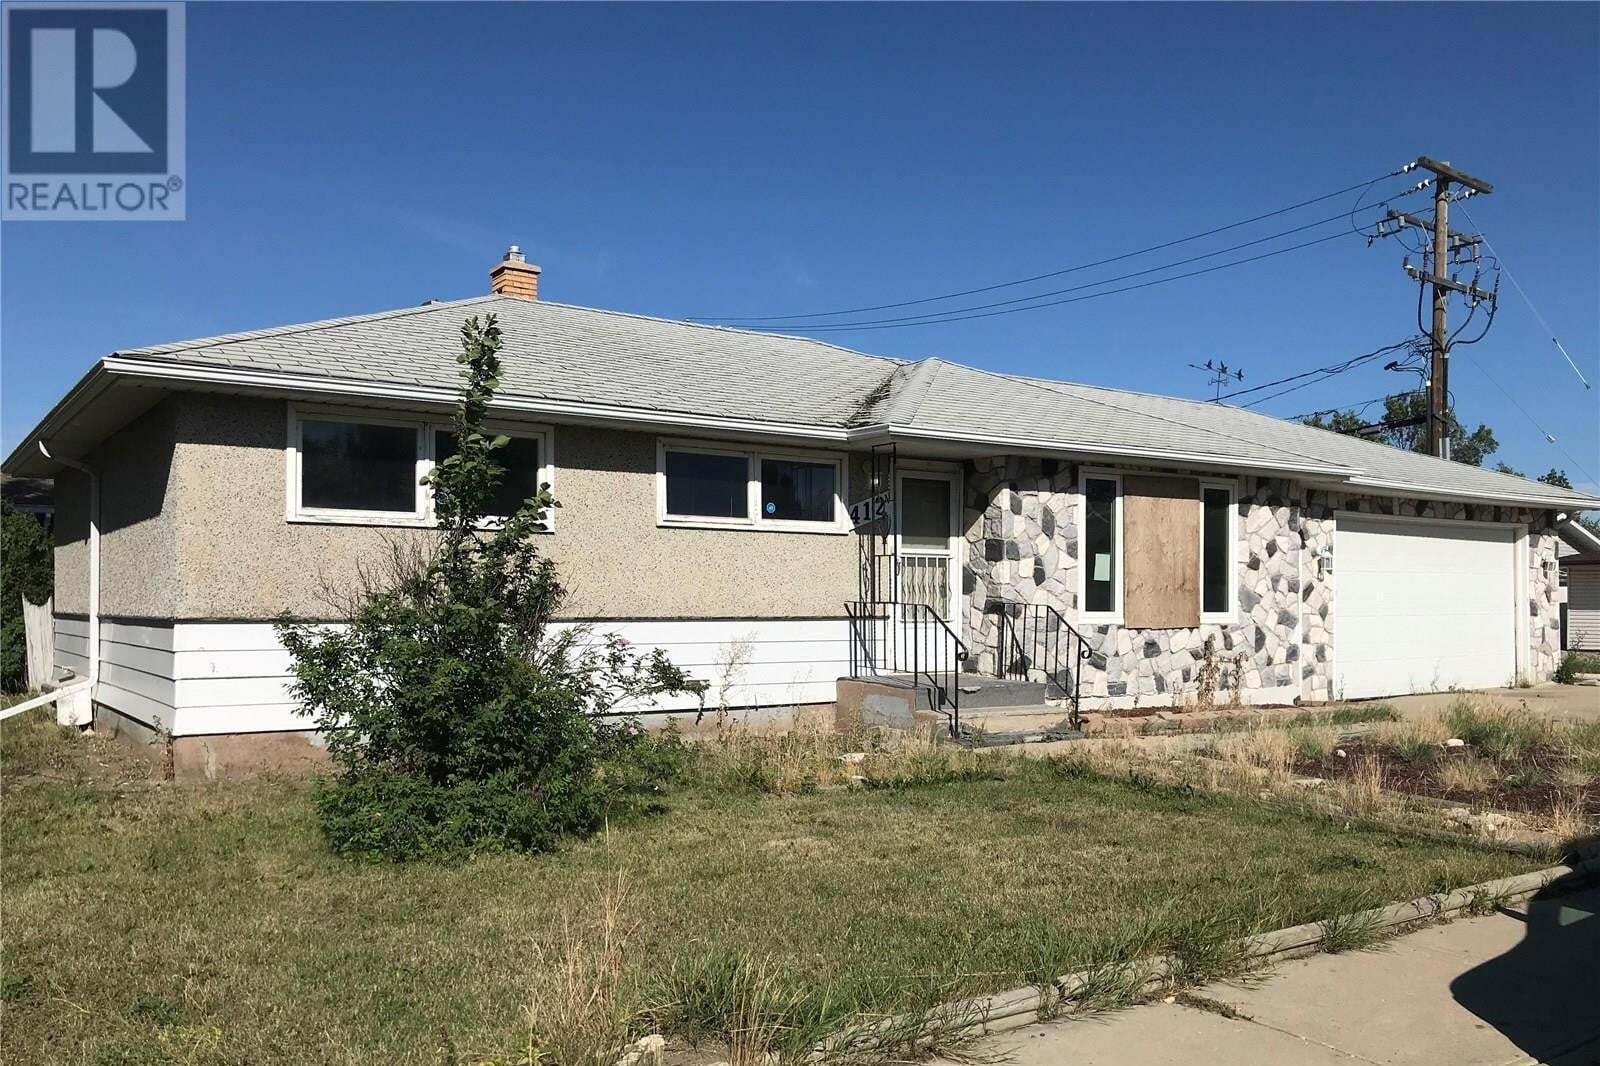 House for sale at 412 Montreal St N Regina Saskatchewan - MLS: SK824111